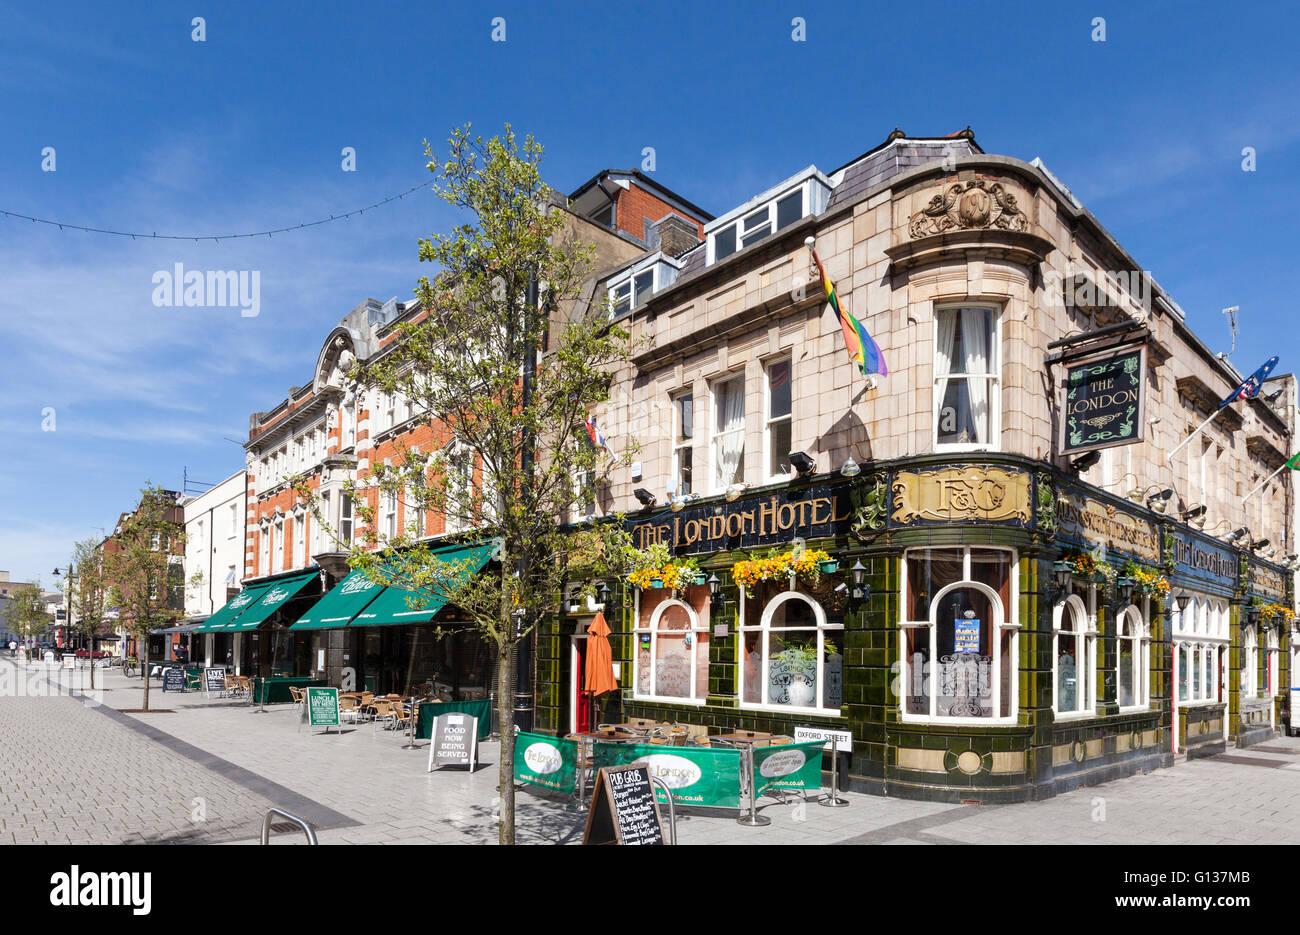 Das London Hotel-Pub und die Oxford Street in Southampton, Hampshire, UK Stockbild